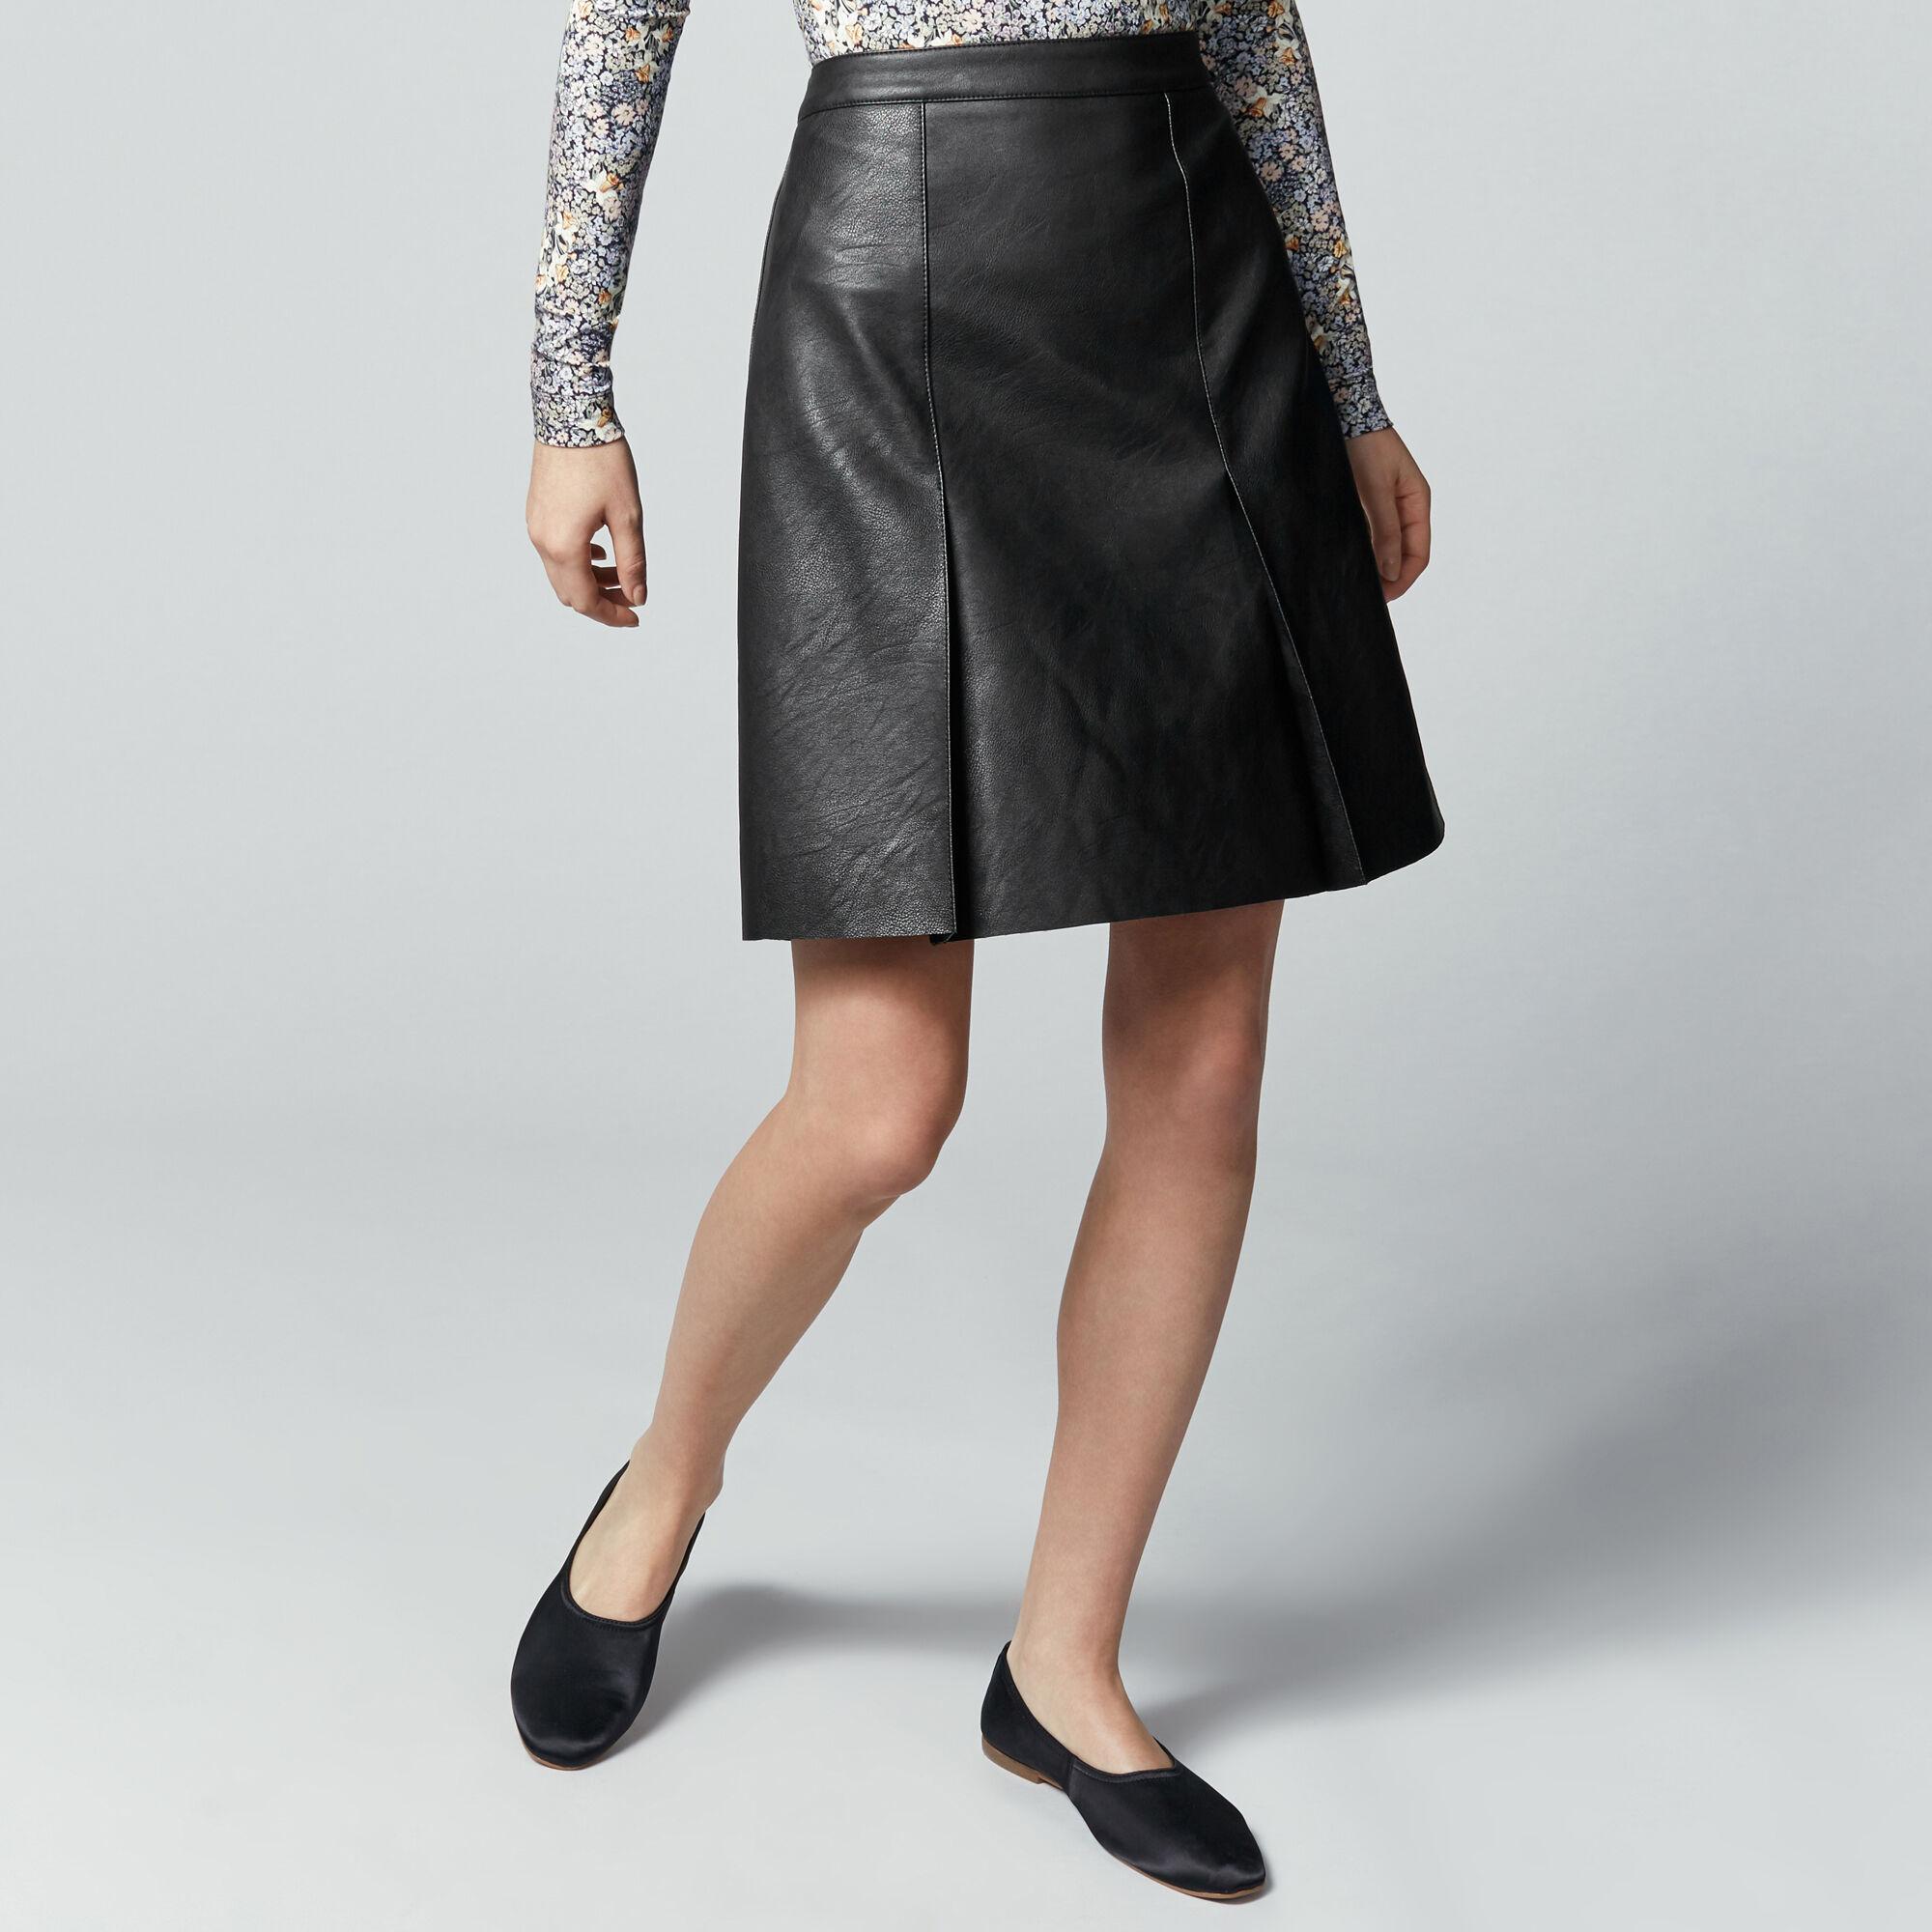 Warehouse, Faux Leather Knee Length Skirt Black 1